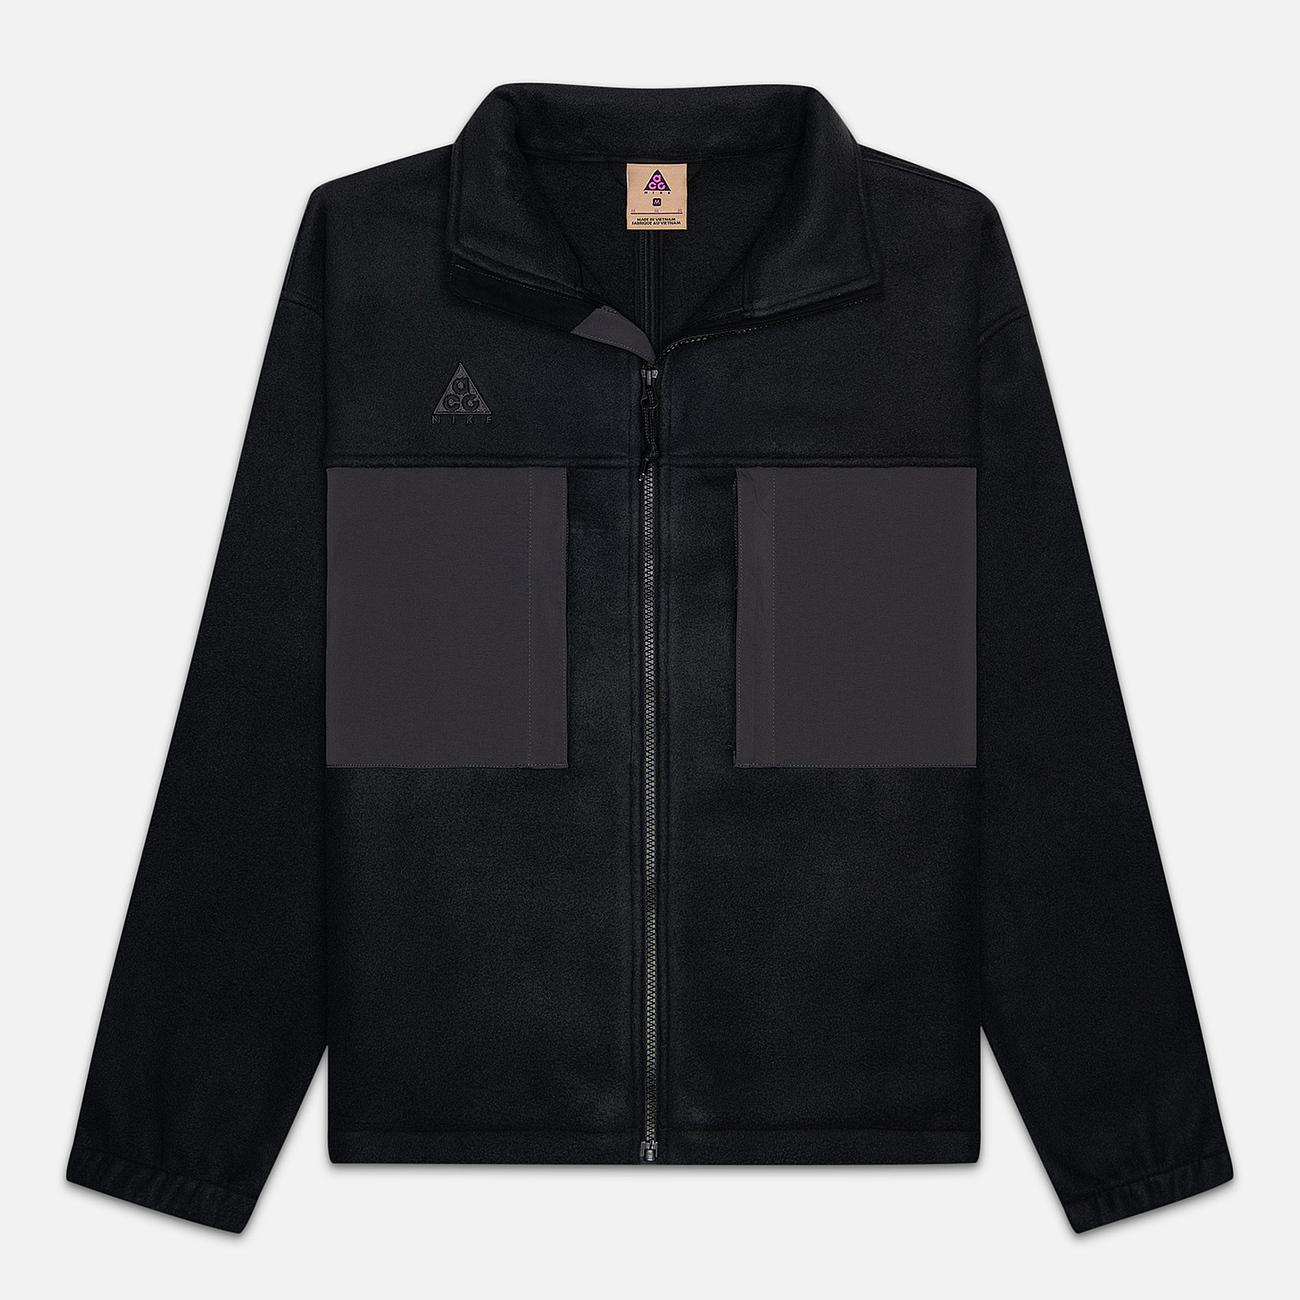 Мужская куртка Nike ACG Microfleece Black/Anthracite/Anthracite